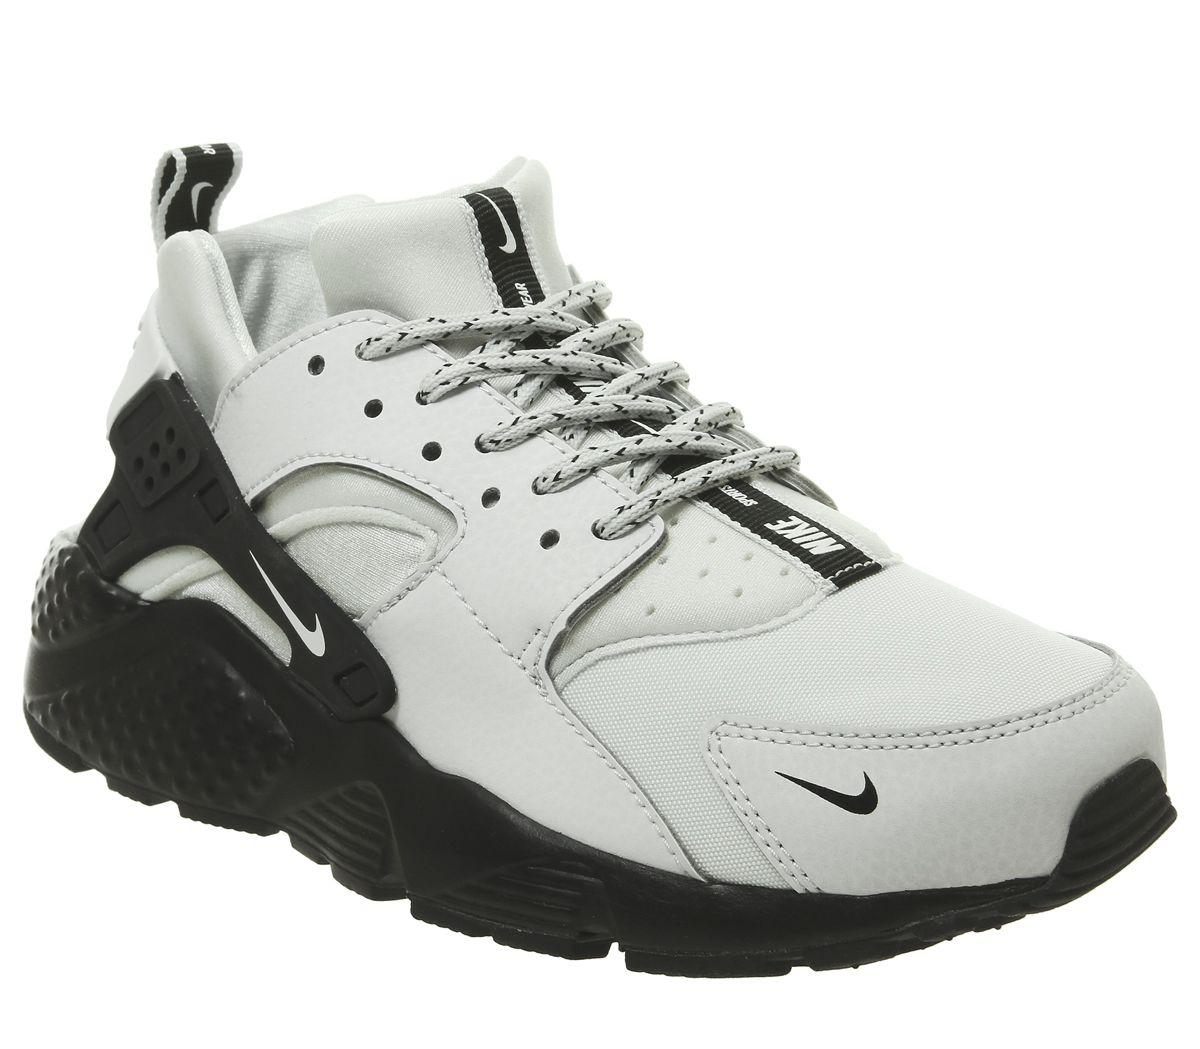 new product 1636b 032a2 Nike Huarache Gs Trainers Pure Platinum White Black - Unisex